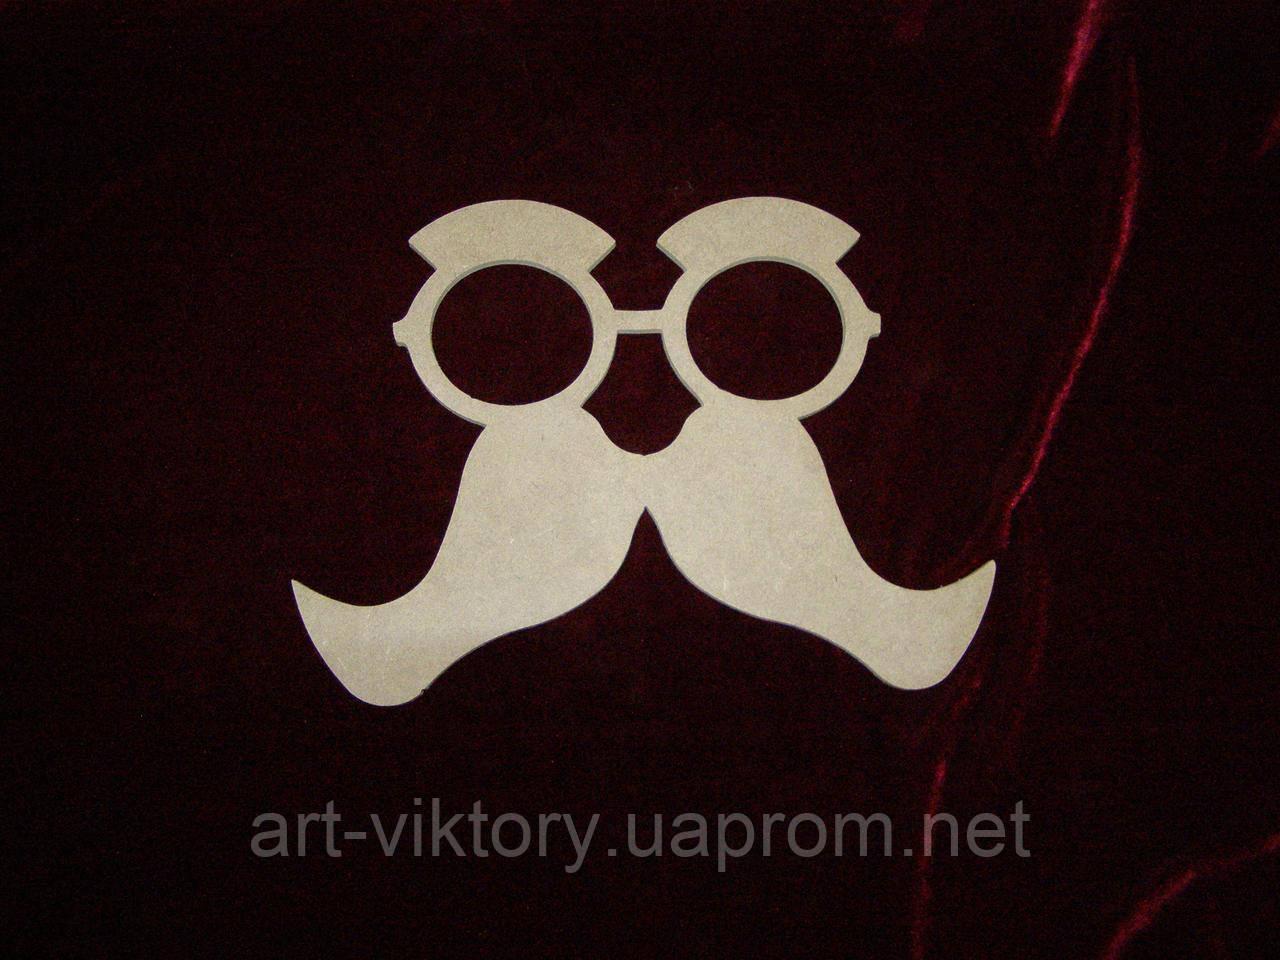 Очки с усами (27 х 19 см), декор